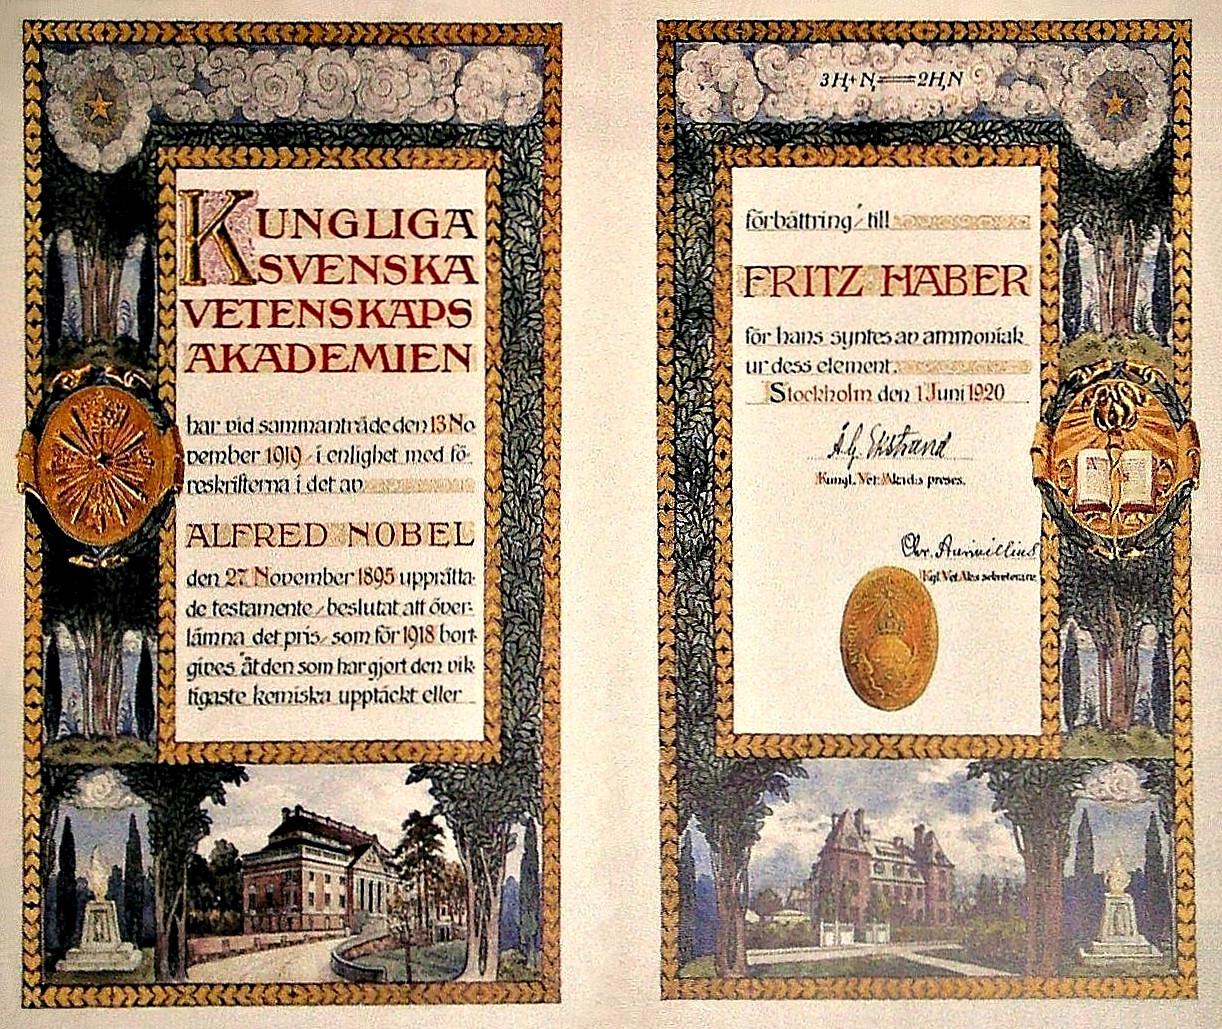 chemistry nobel prize essay Chemistry nobel prize winners essay chemistry nobel prize winners irving langmuir the nobel prize in chemistry 1932 irving langmuir was a nobel prize-winning.